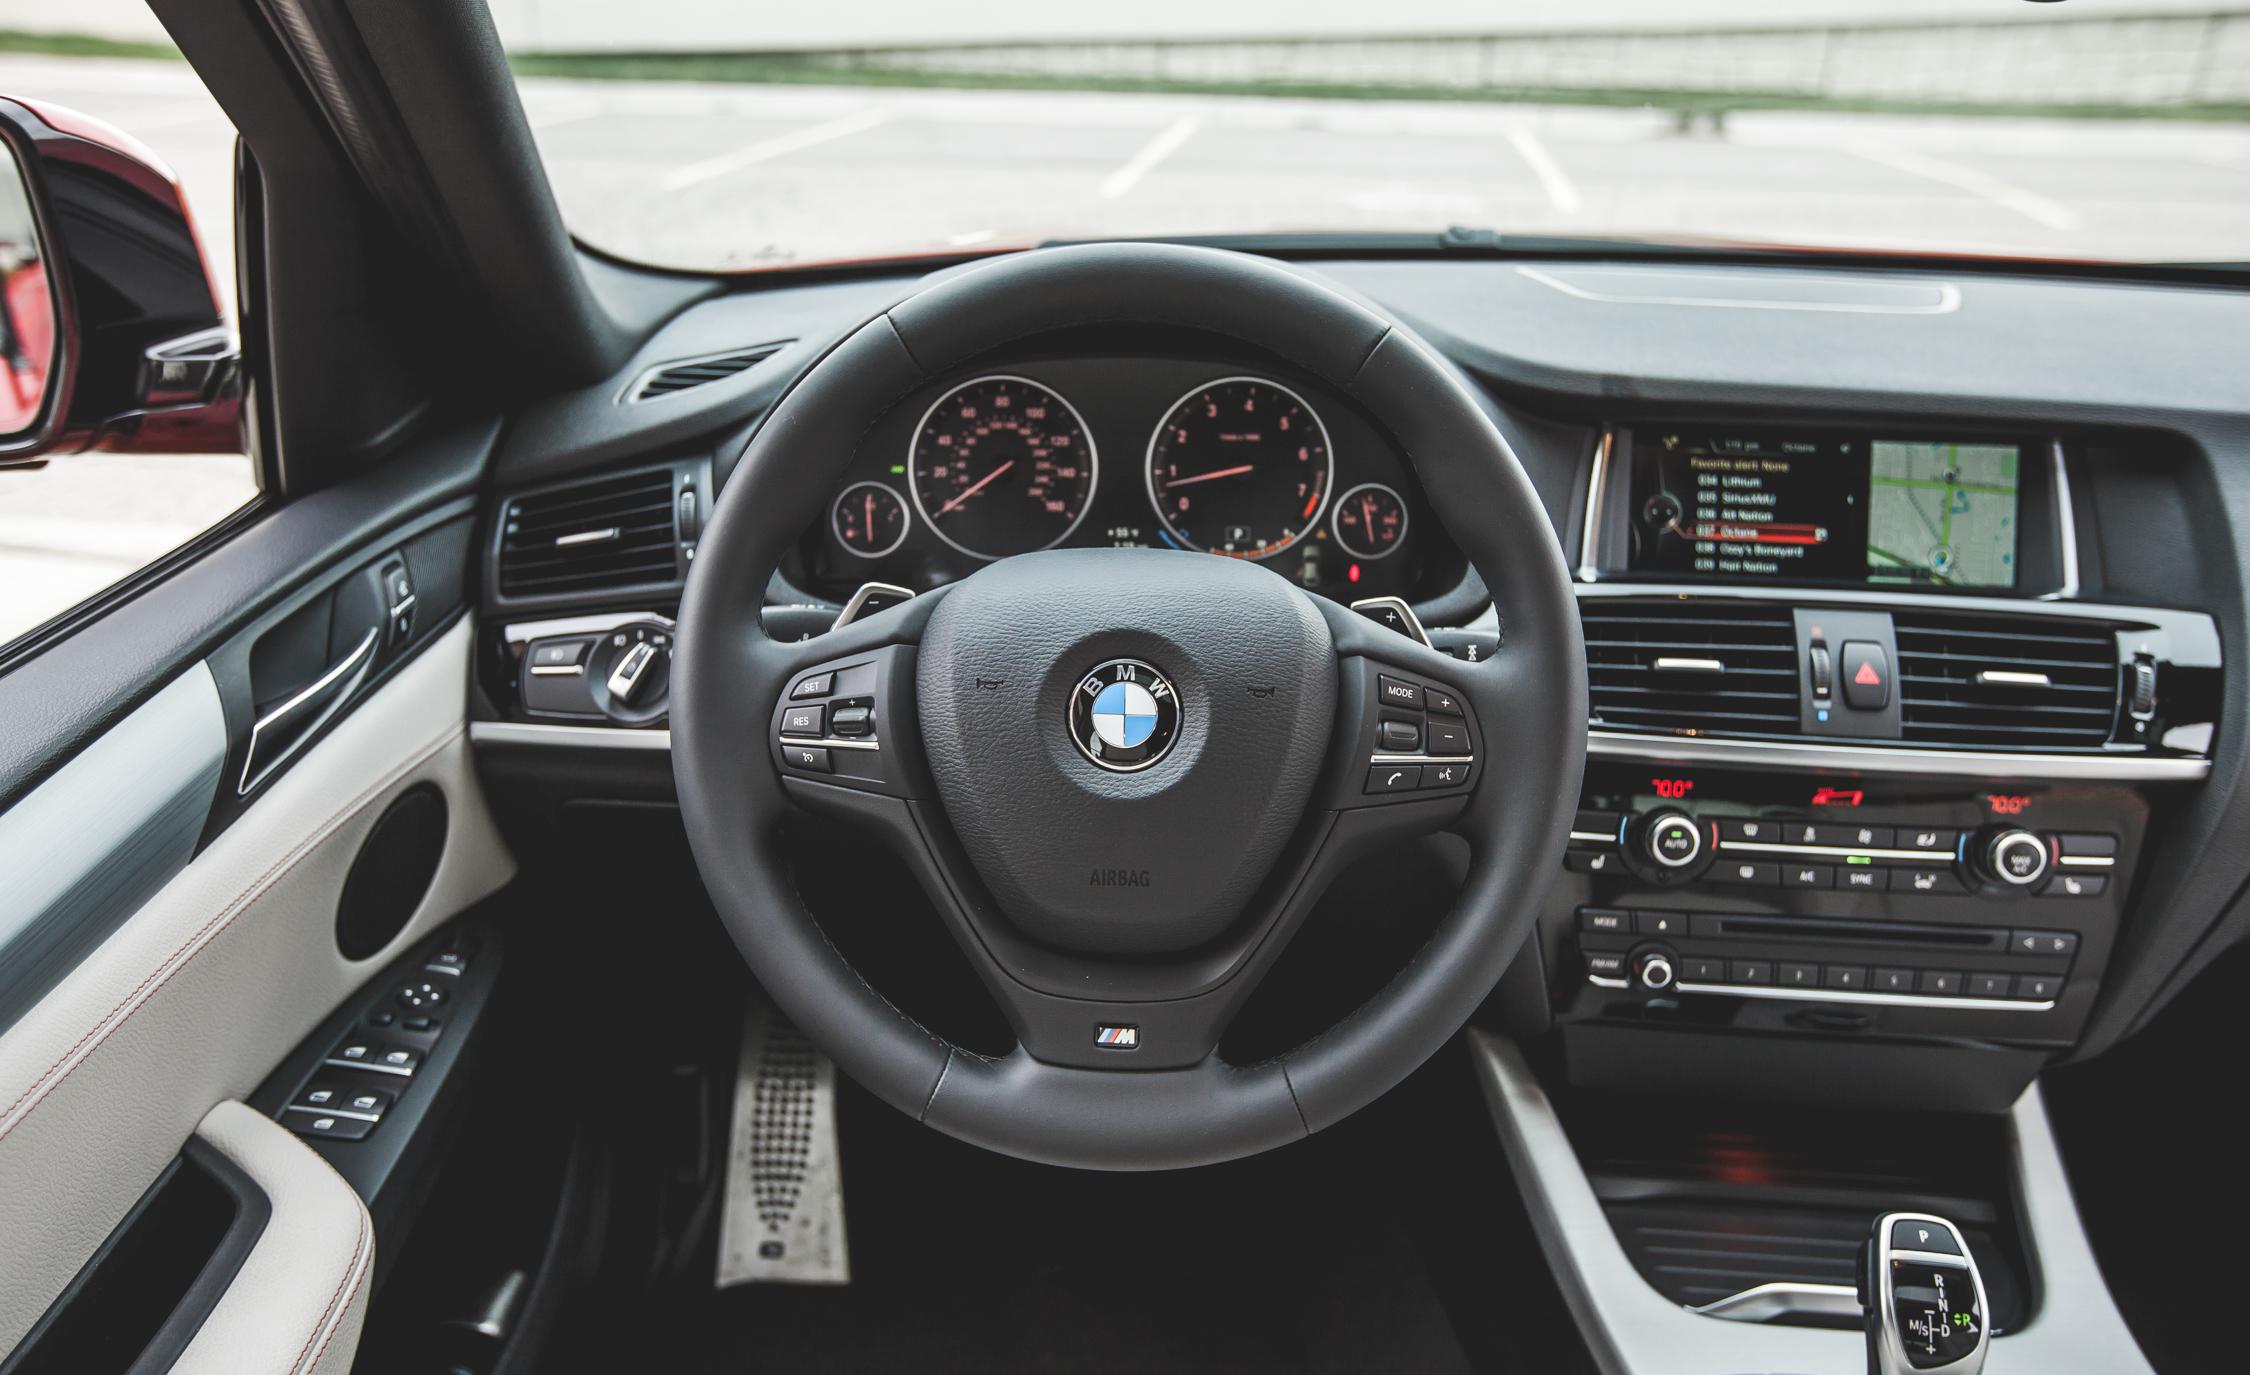 2015 BMW X4 XDrive28i Interior (Photo 25 of 29)